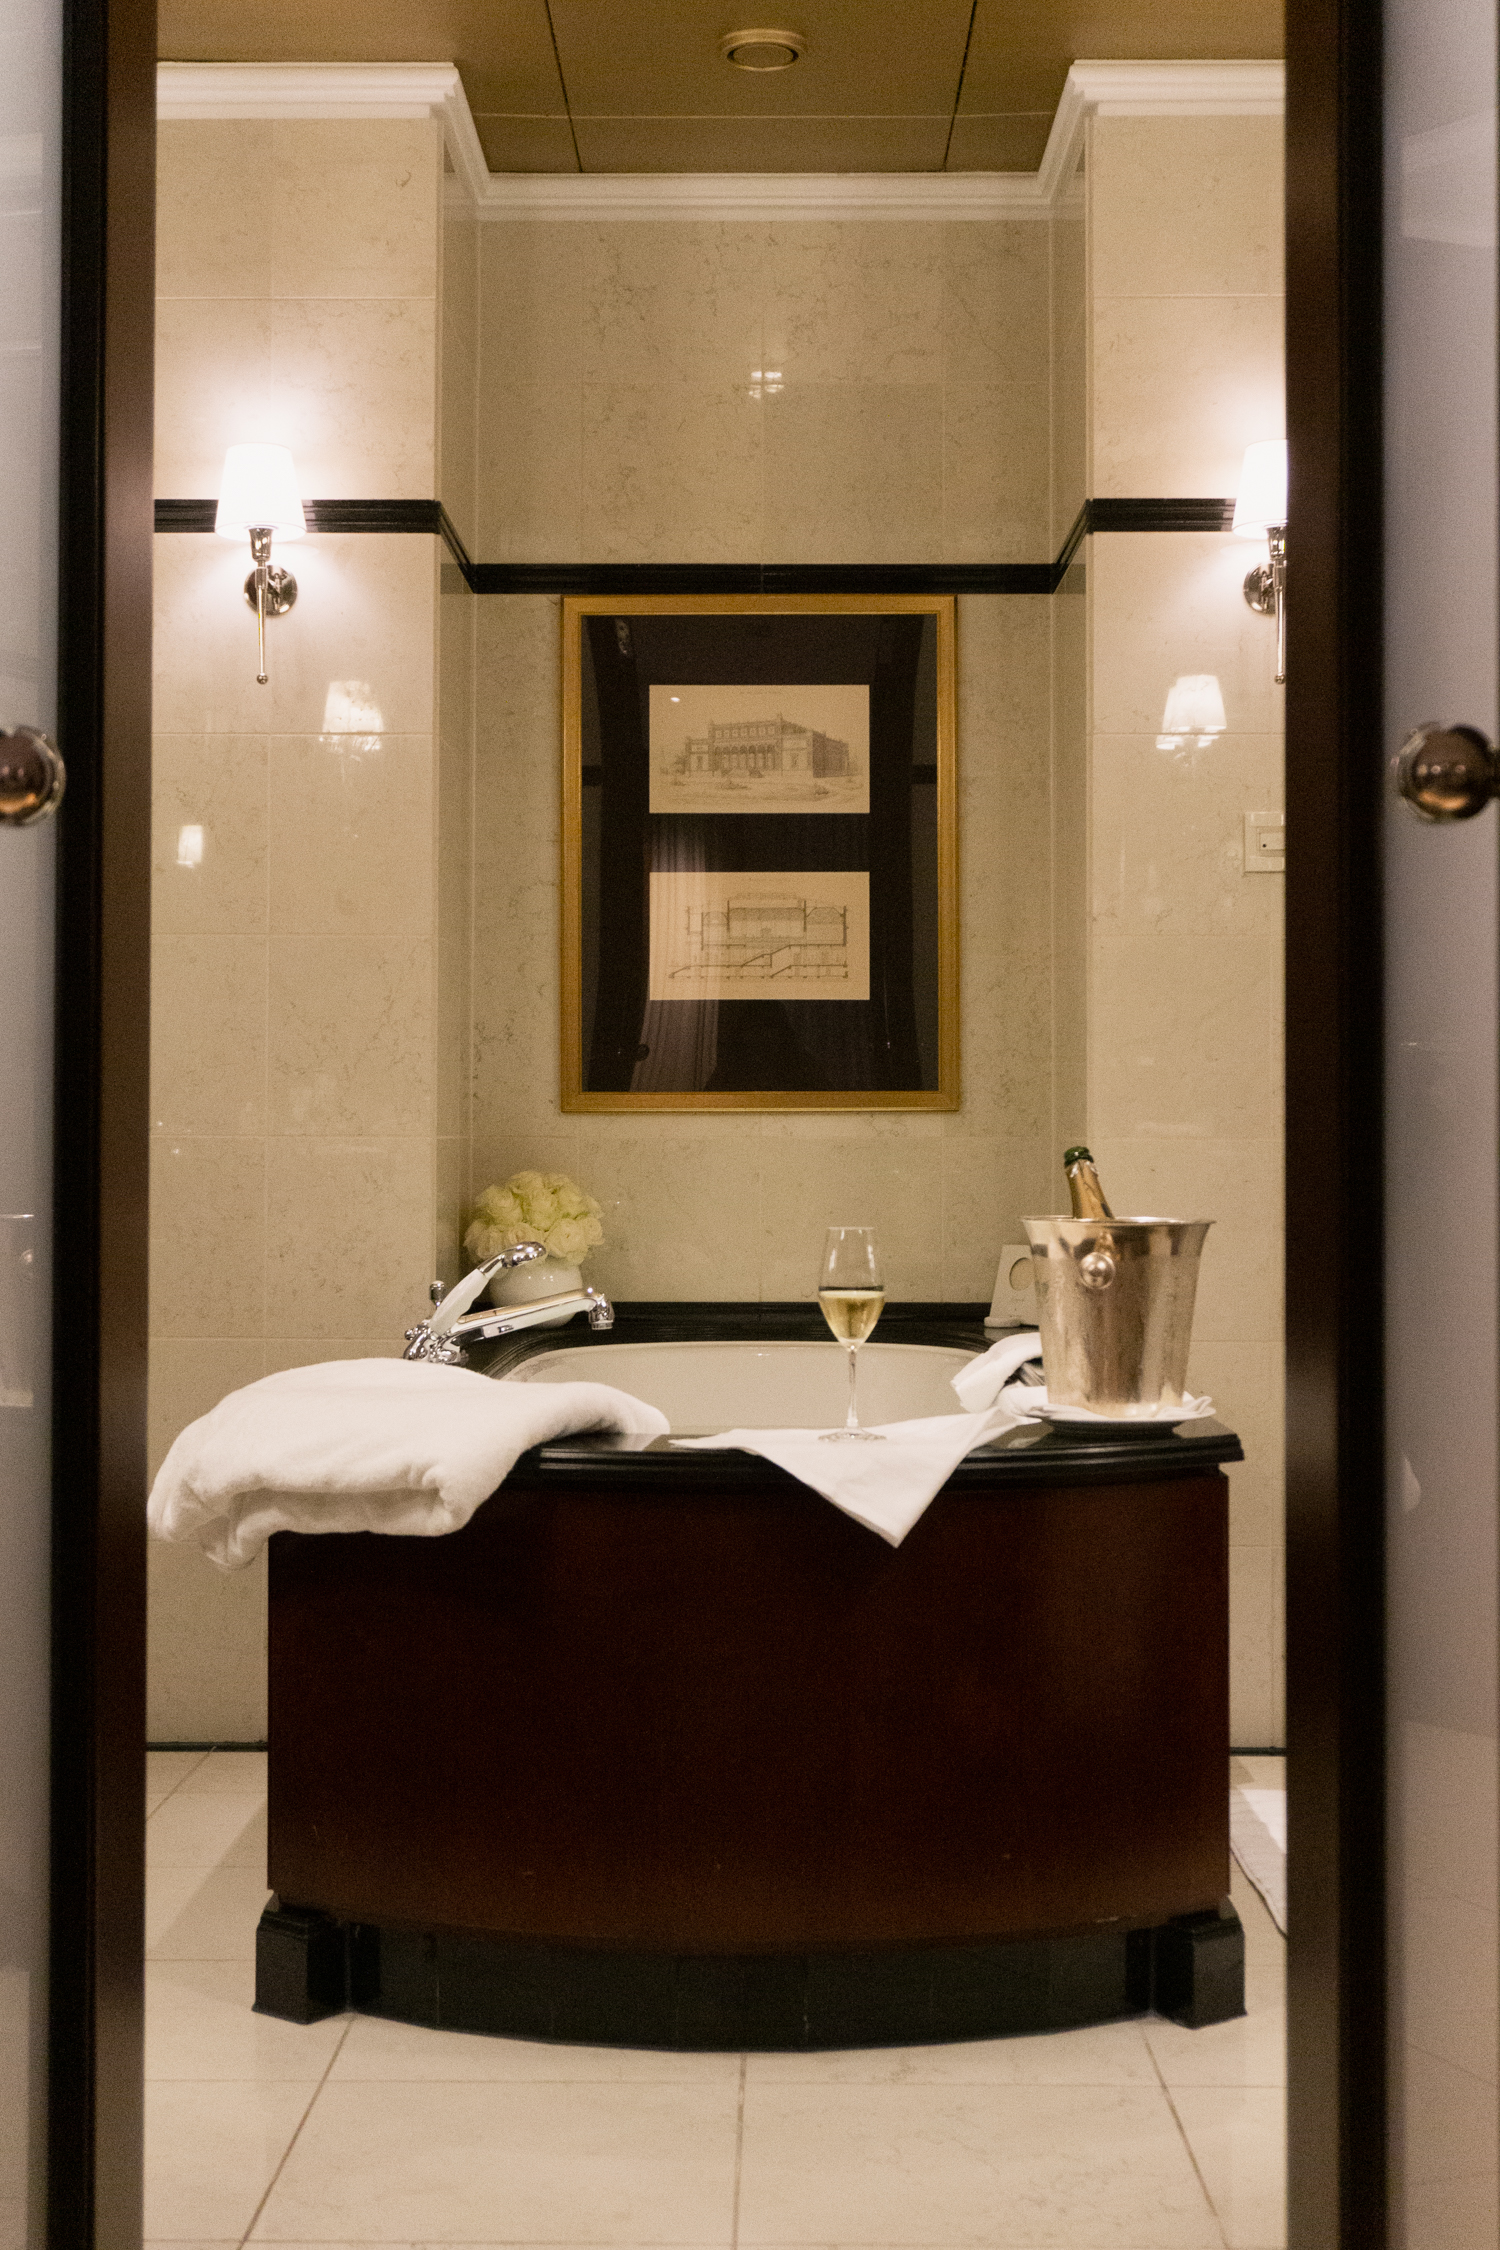 Hotel Adlon Kempinski Berlin Room Interior Germany 5 Star Luxury Travel Blog Rebecca Goddard 37 Rg Daily